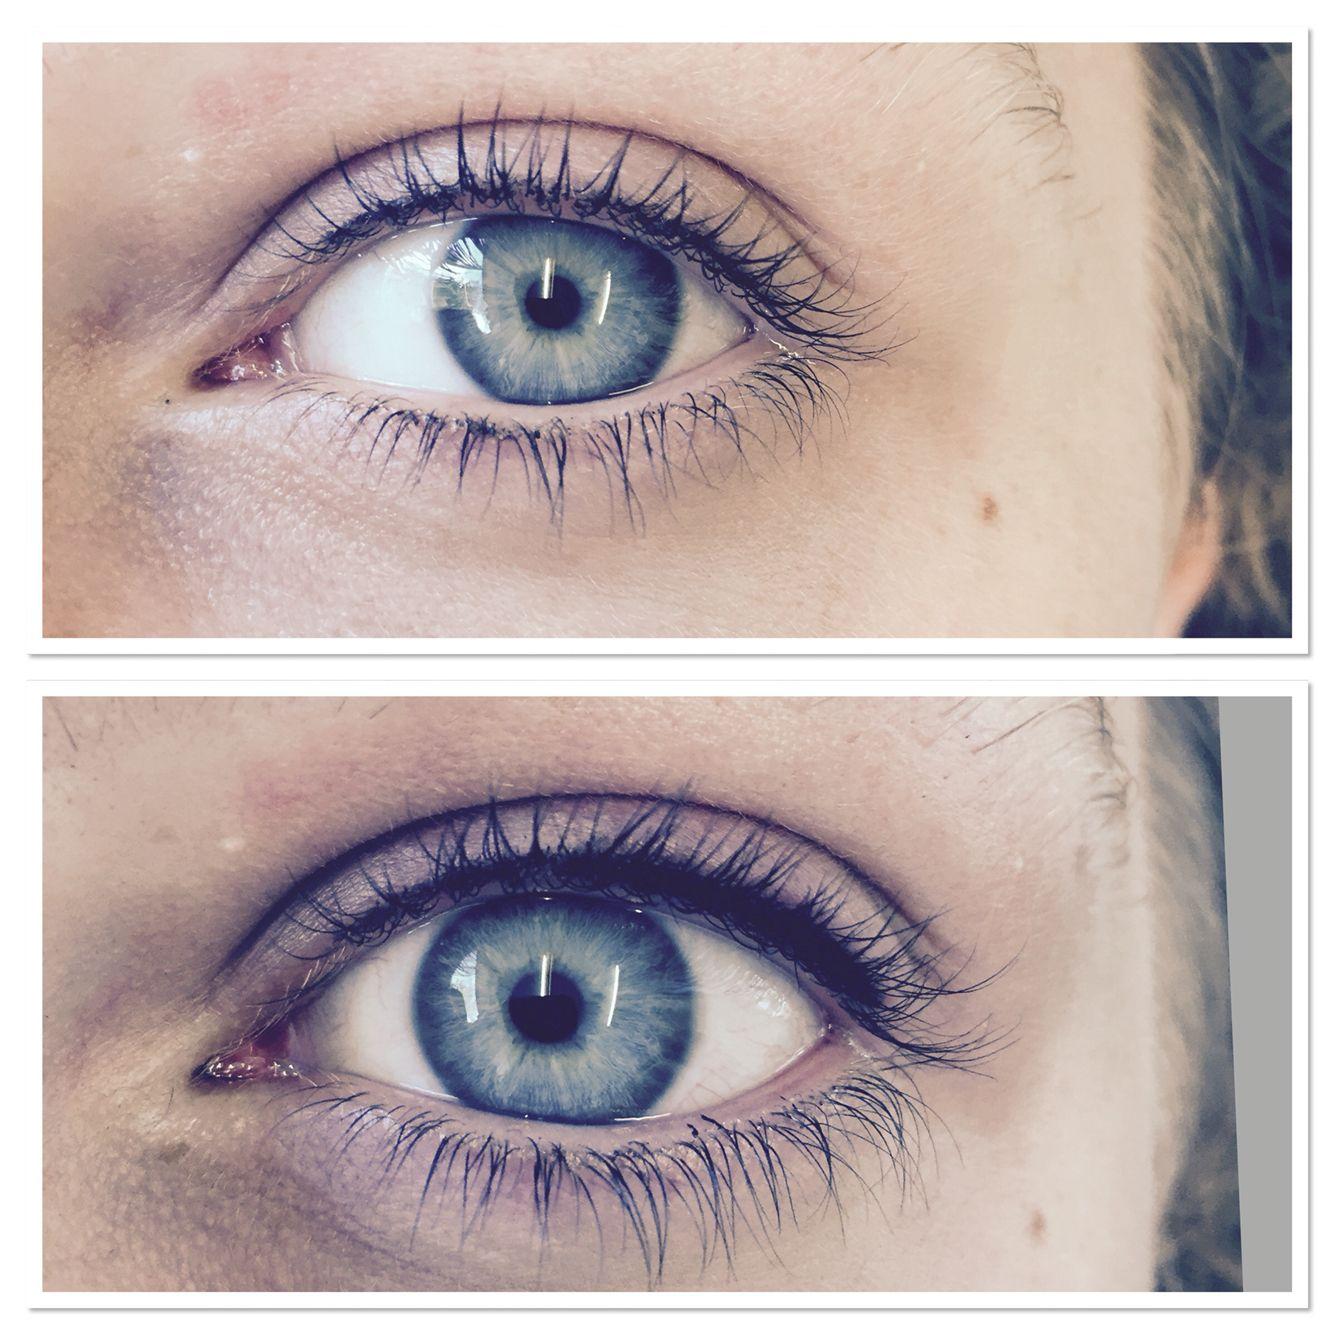 Flawless Permanent Eyeliner Permanent Eyeliner Permanent Makeup Eyeliner Permanent Makeup Eyebrows